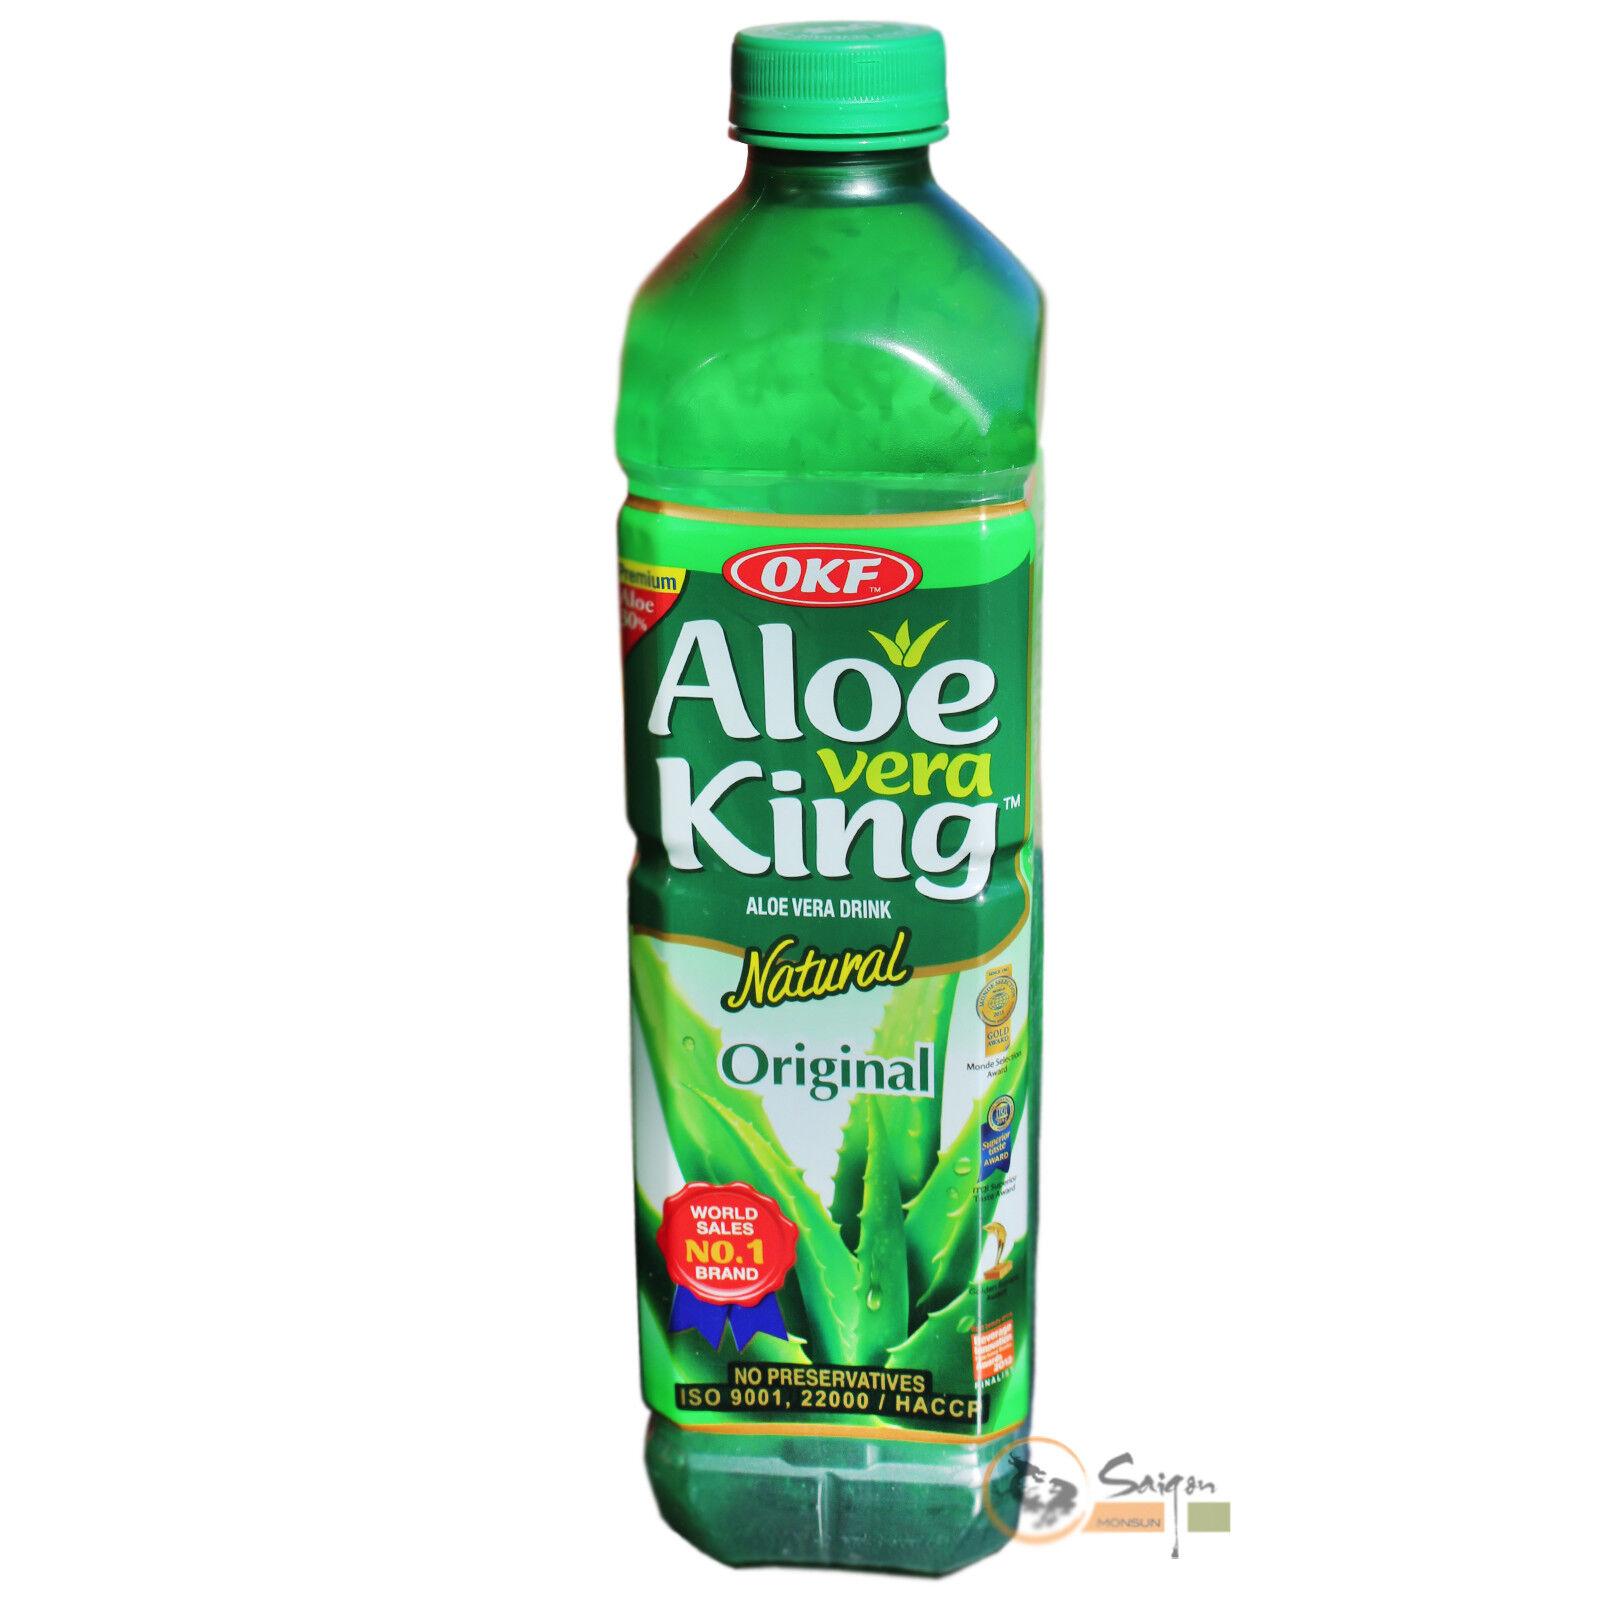 6x1,5L OKF Aloe Vera Getränk Original King Aloe Vera Drink Korea